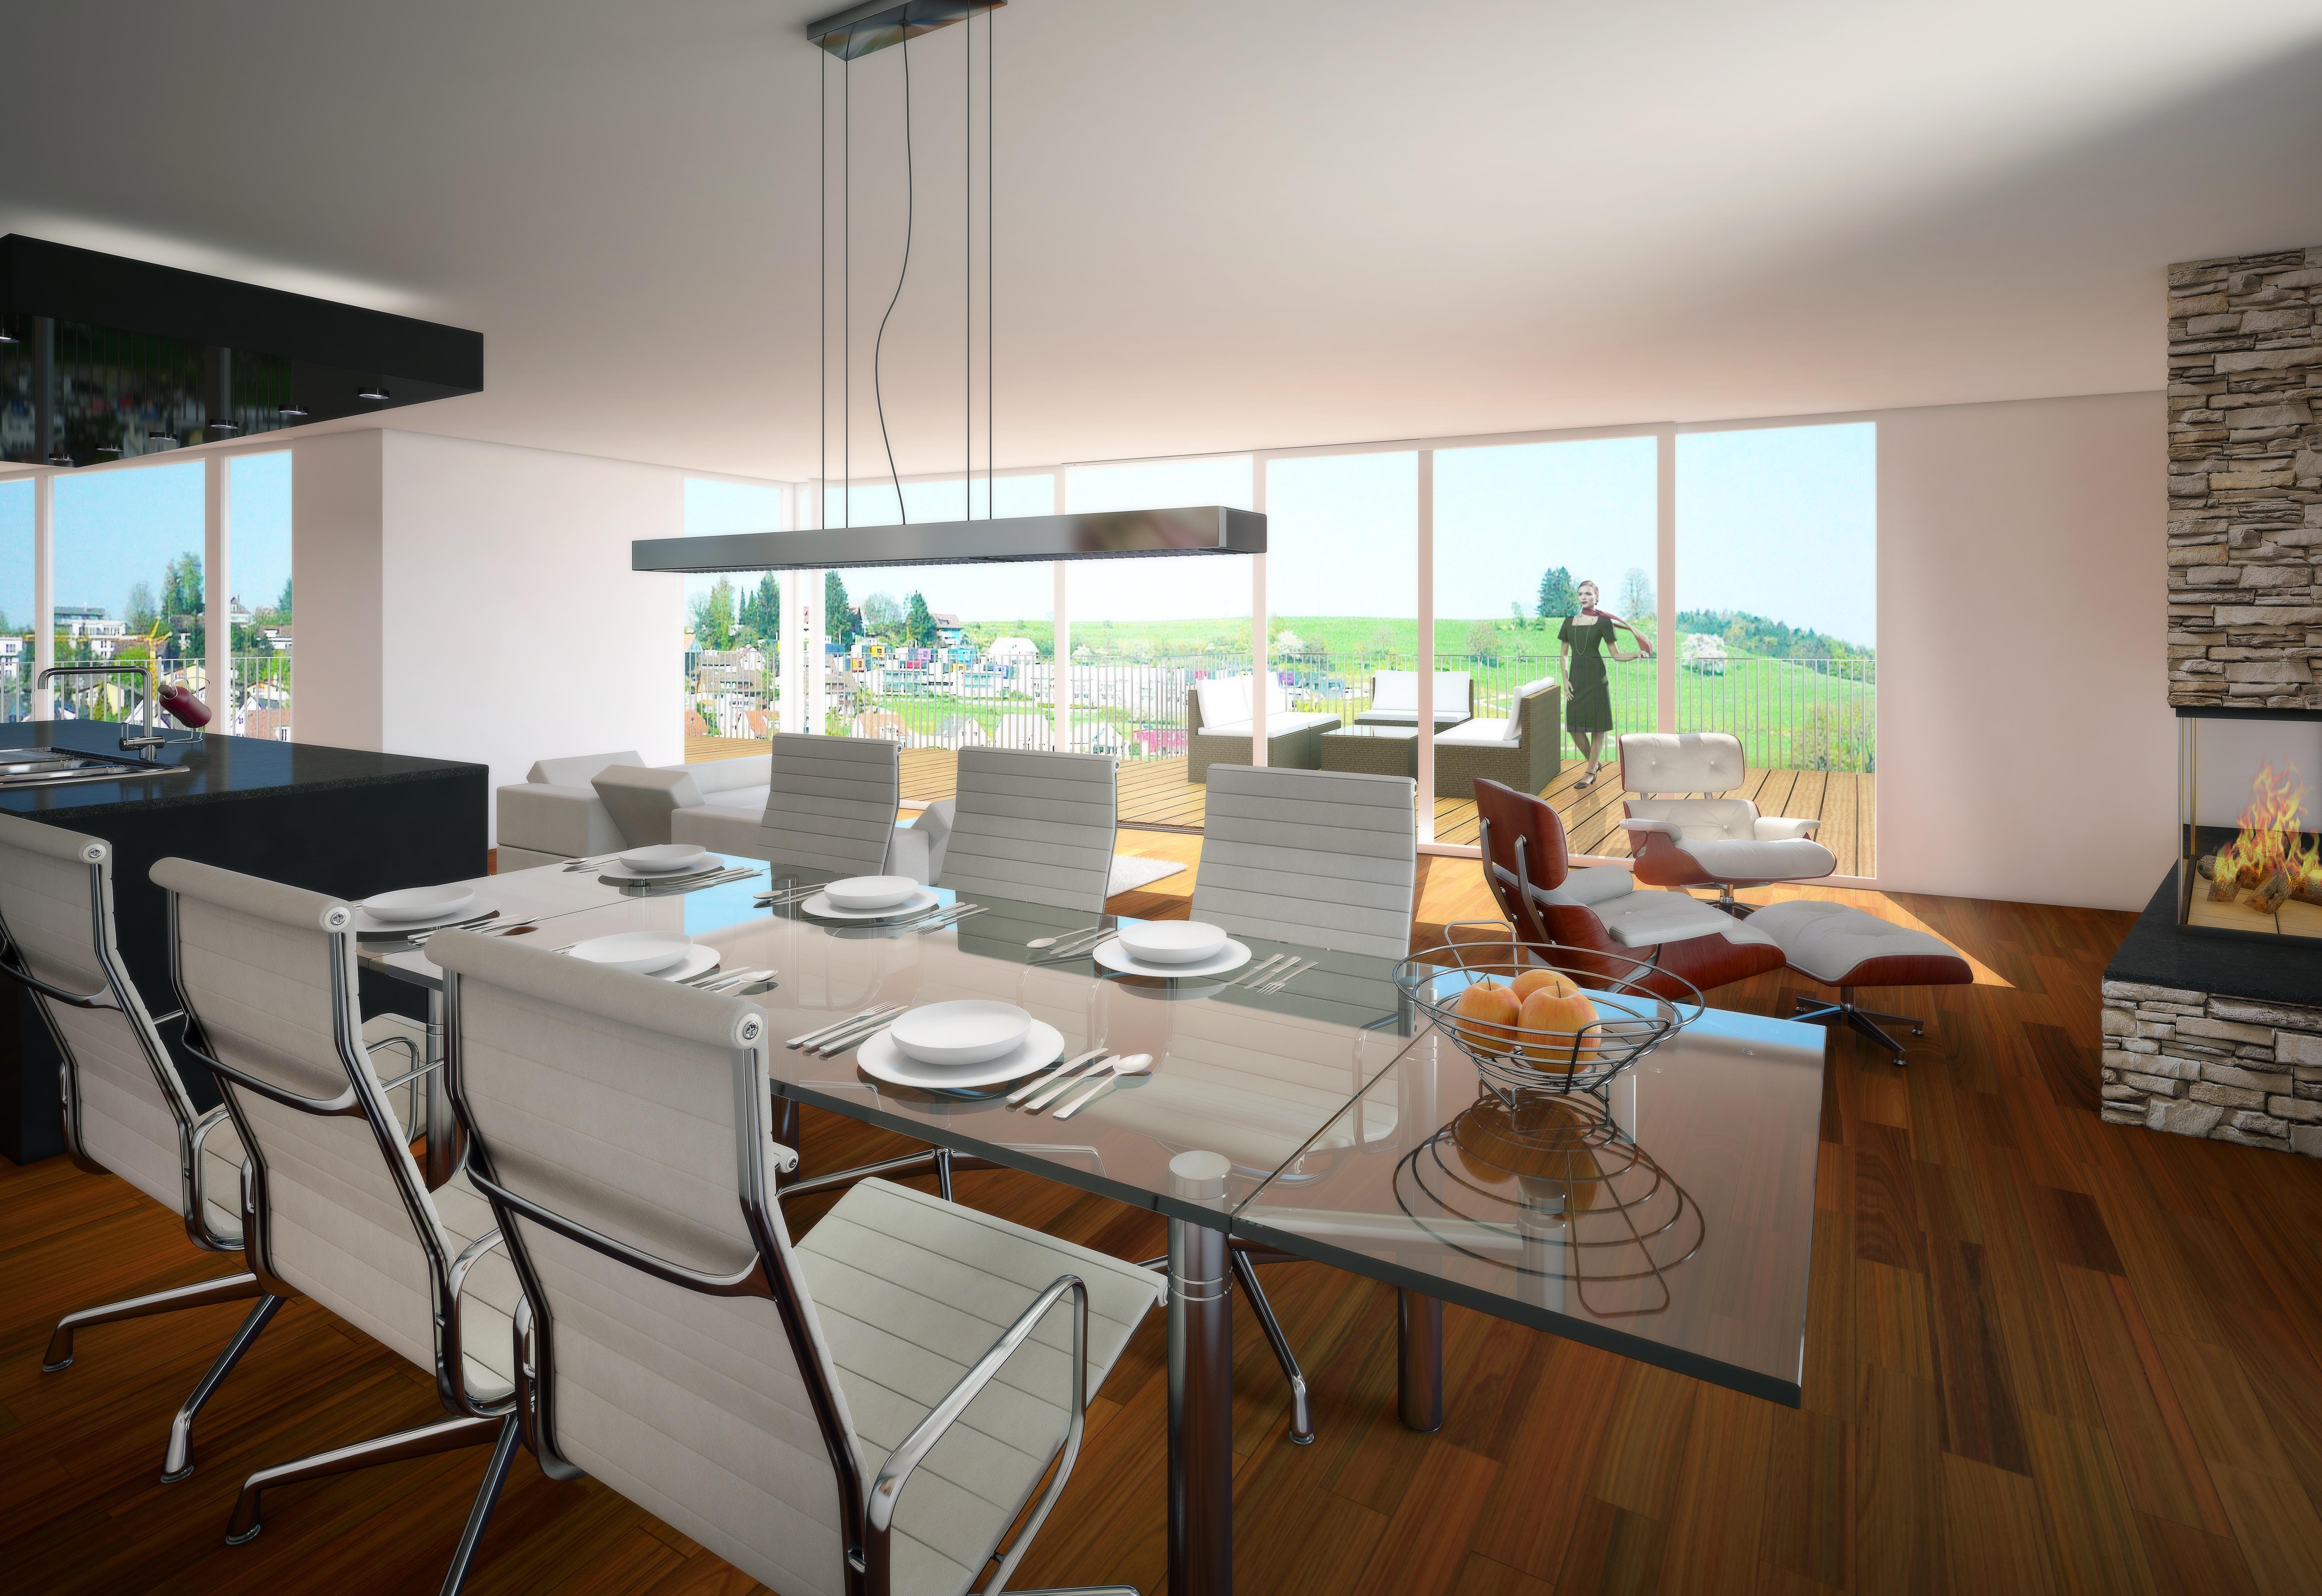 Fotos gratis paisaje arquitectura interior edificio for Diseno de interiores 3d gratis